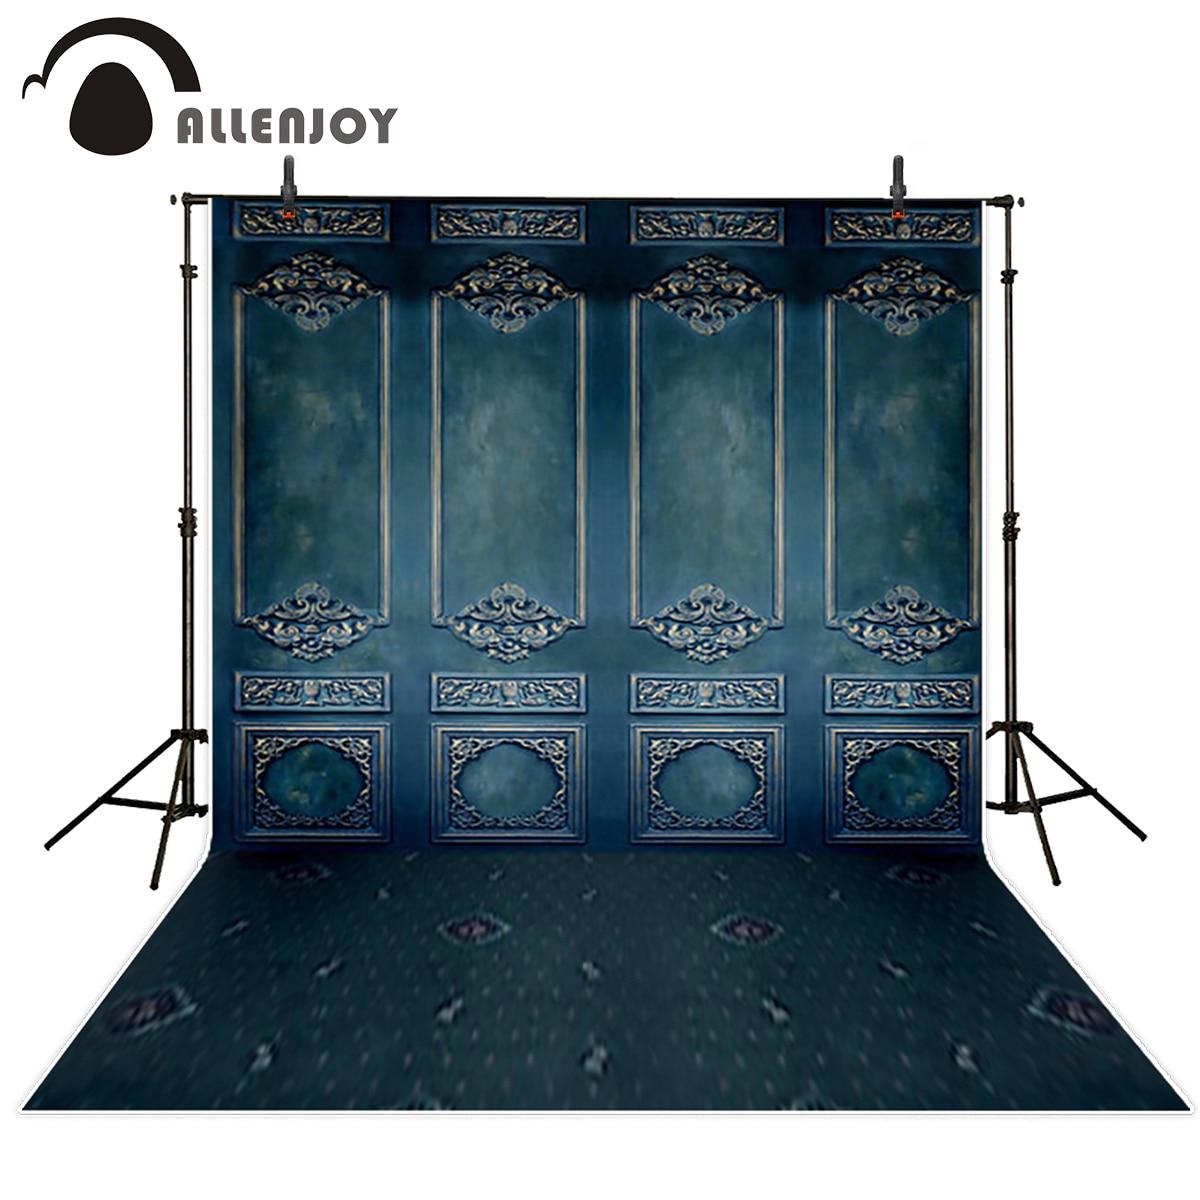 Allenjoy fondo para foto azul oscuro vintage pared de ladrillo FONDO EUROPEO impreso cabina de estudio fotográfico profesional